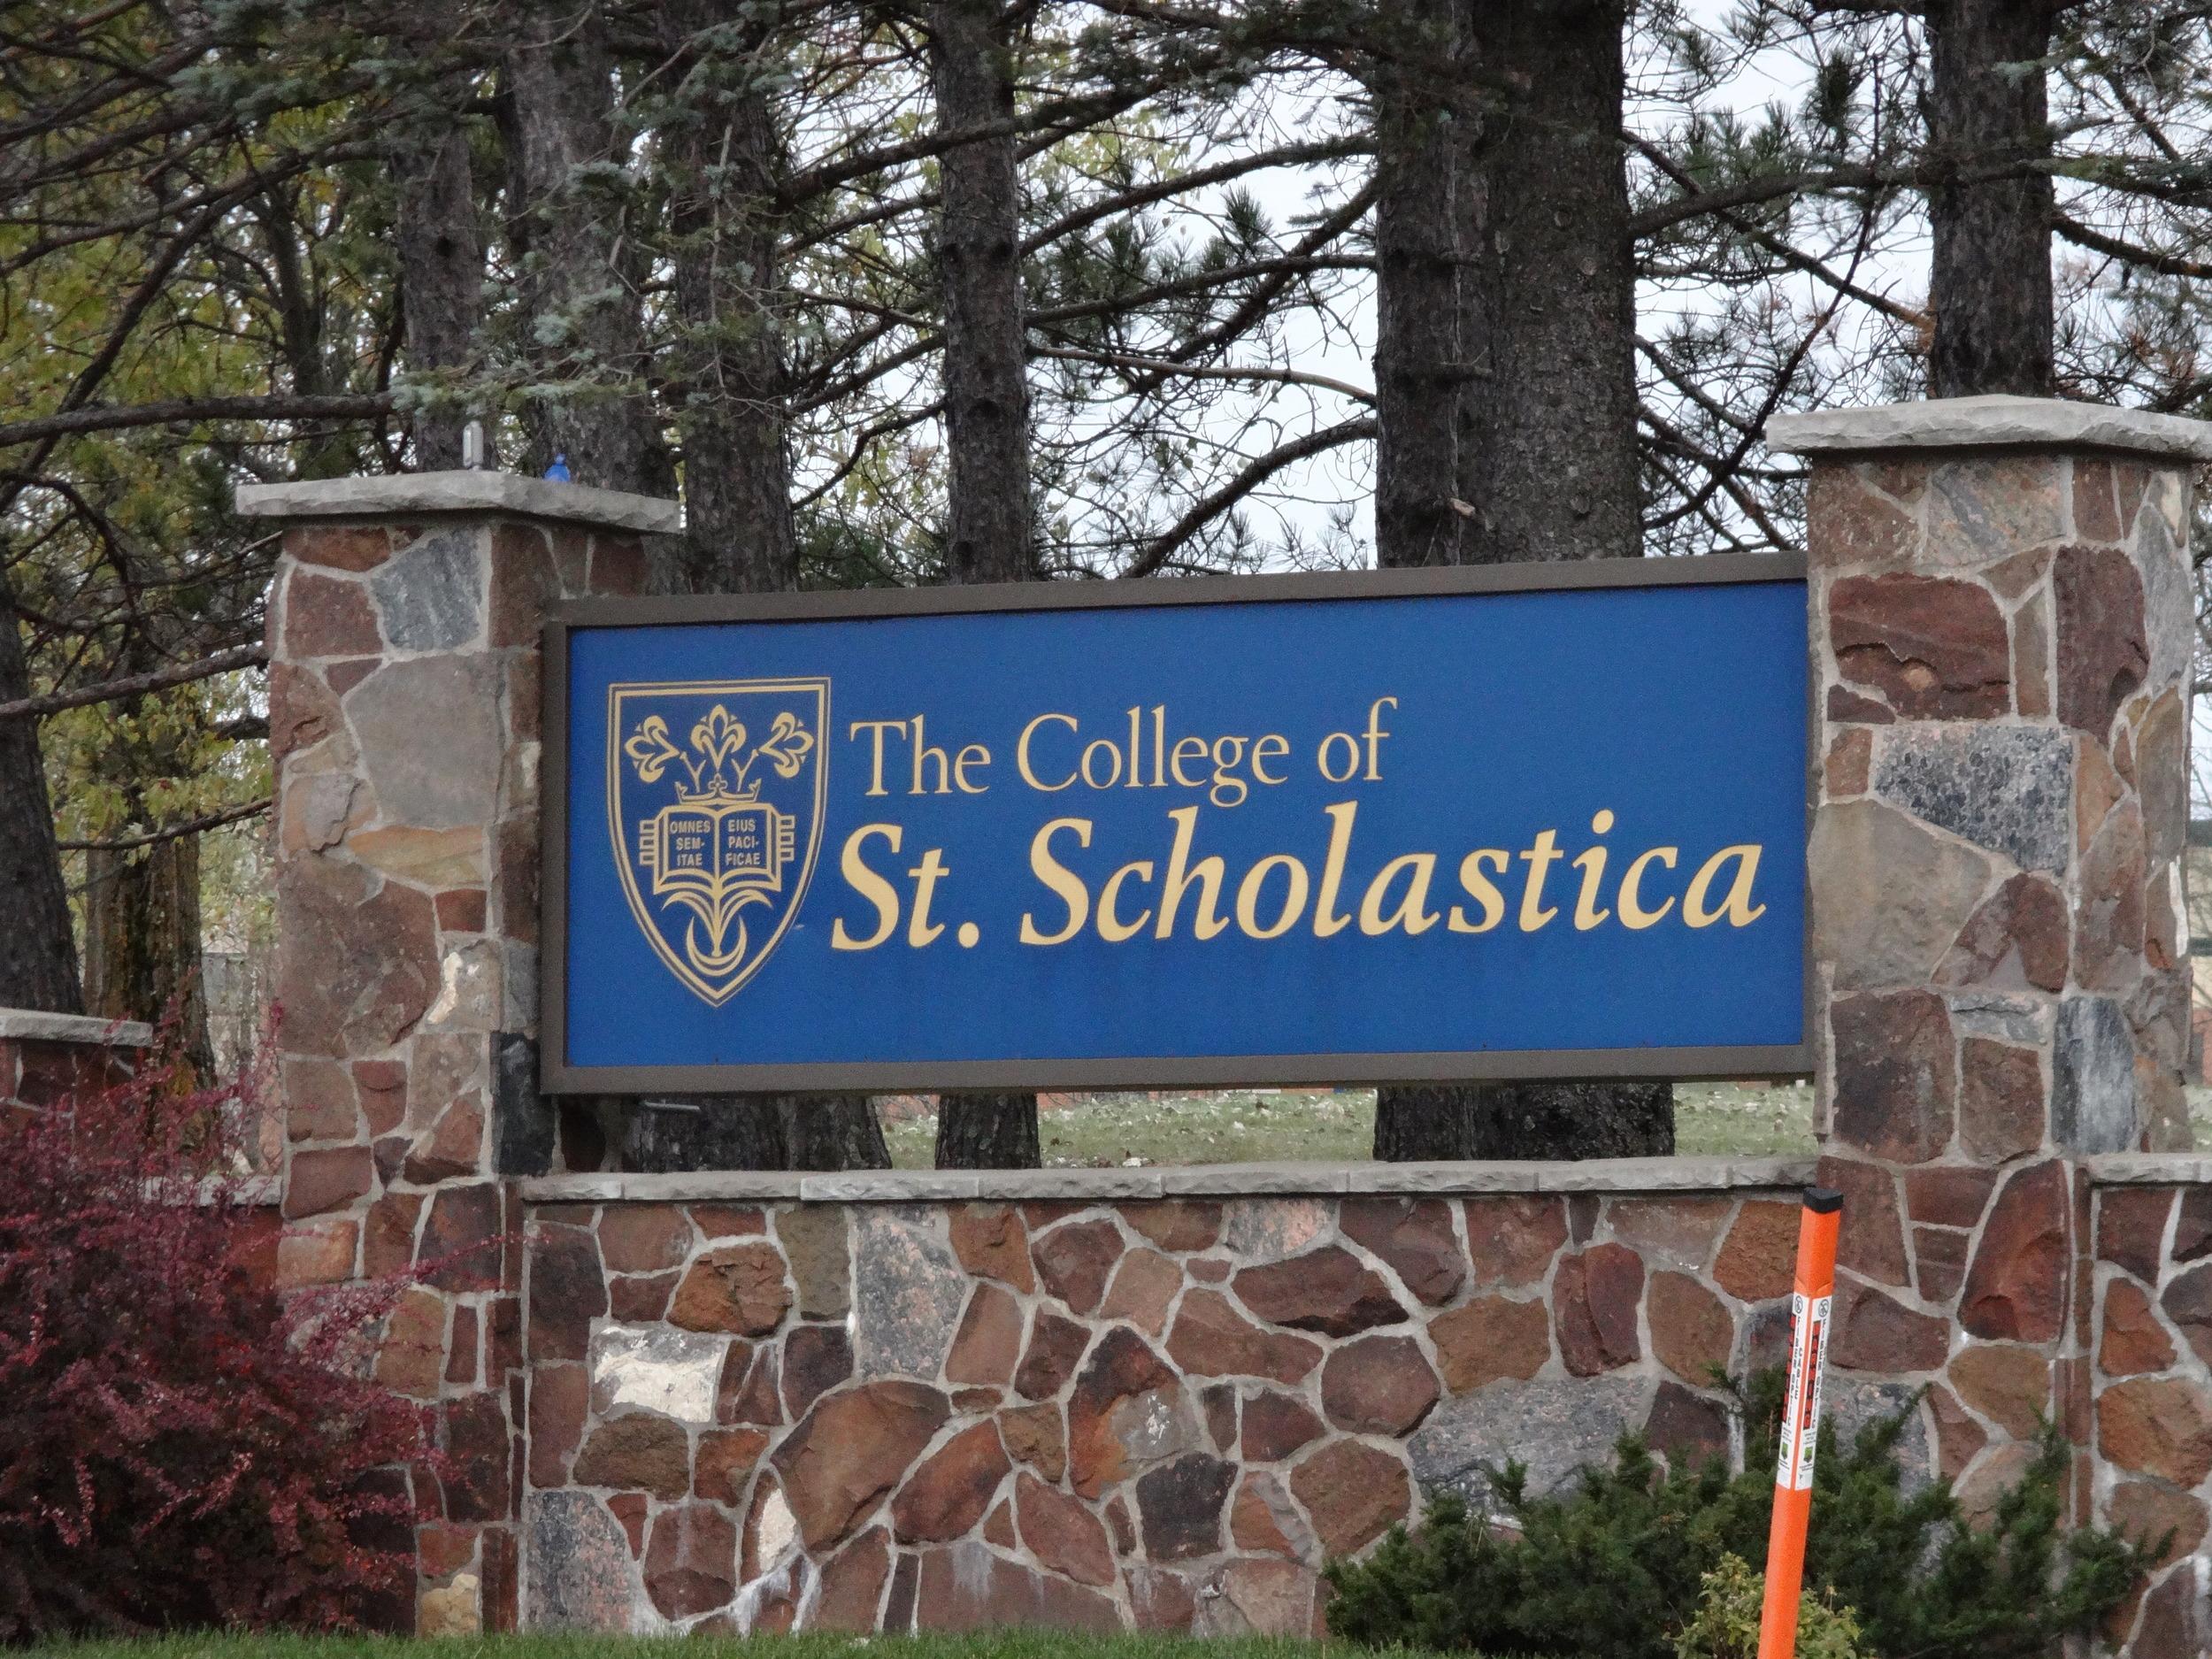 College of St. Scholastica